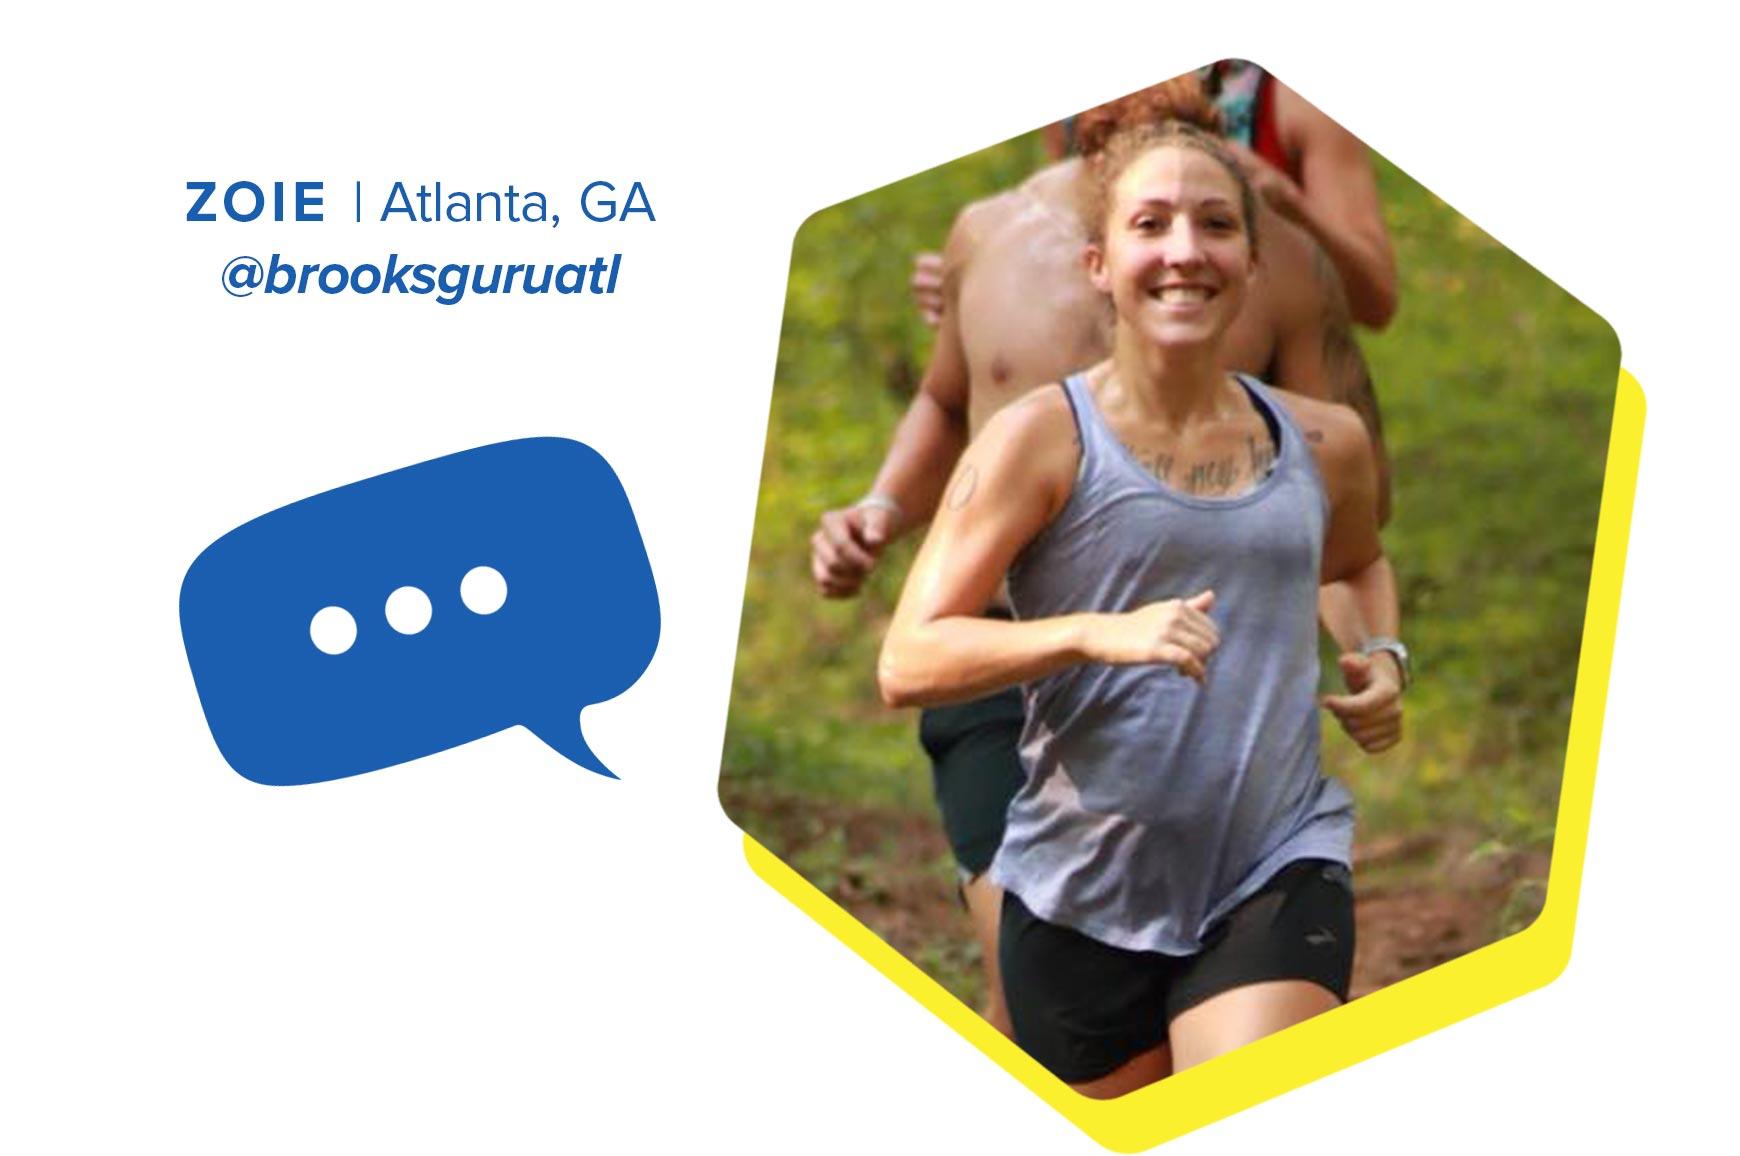 Zoie on a run and text that reads 'Zoie| Atlanta, GA | @brooksguruatl